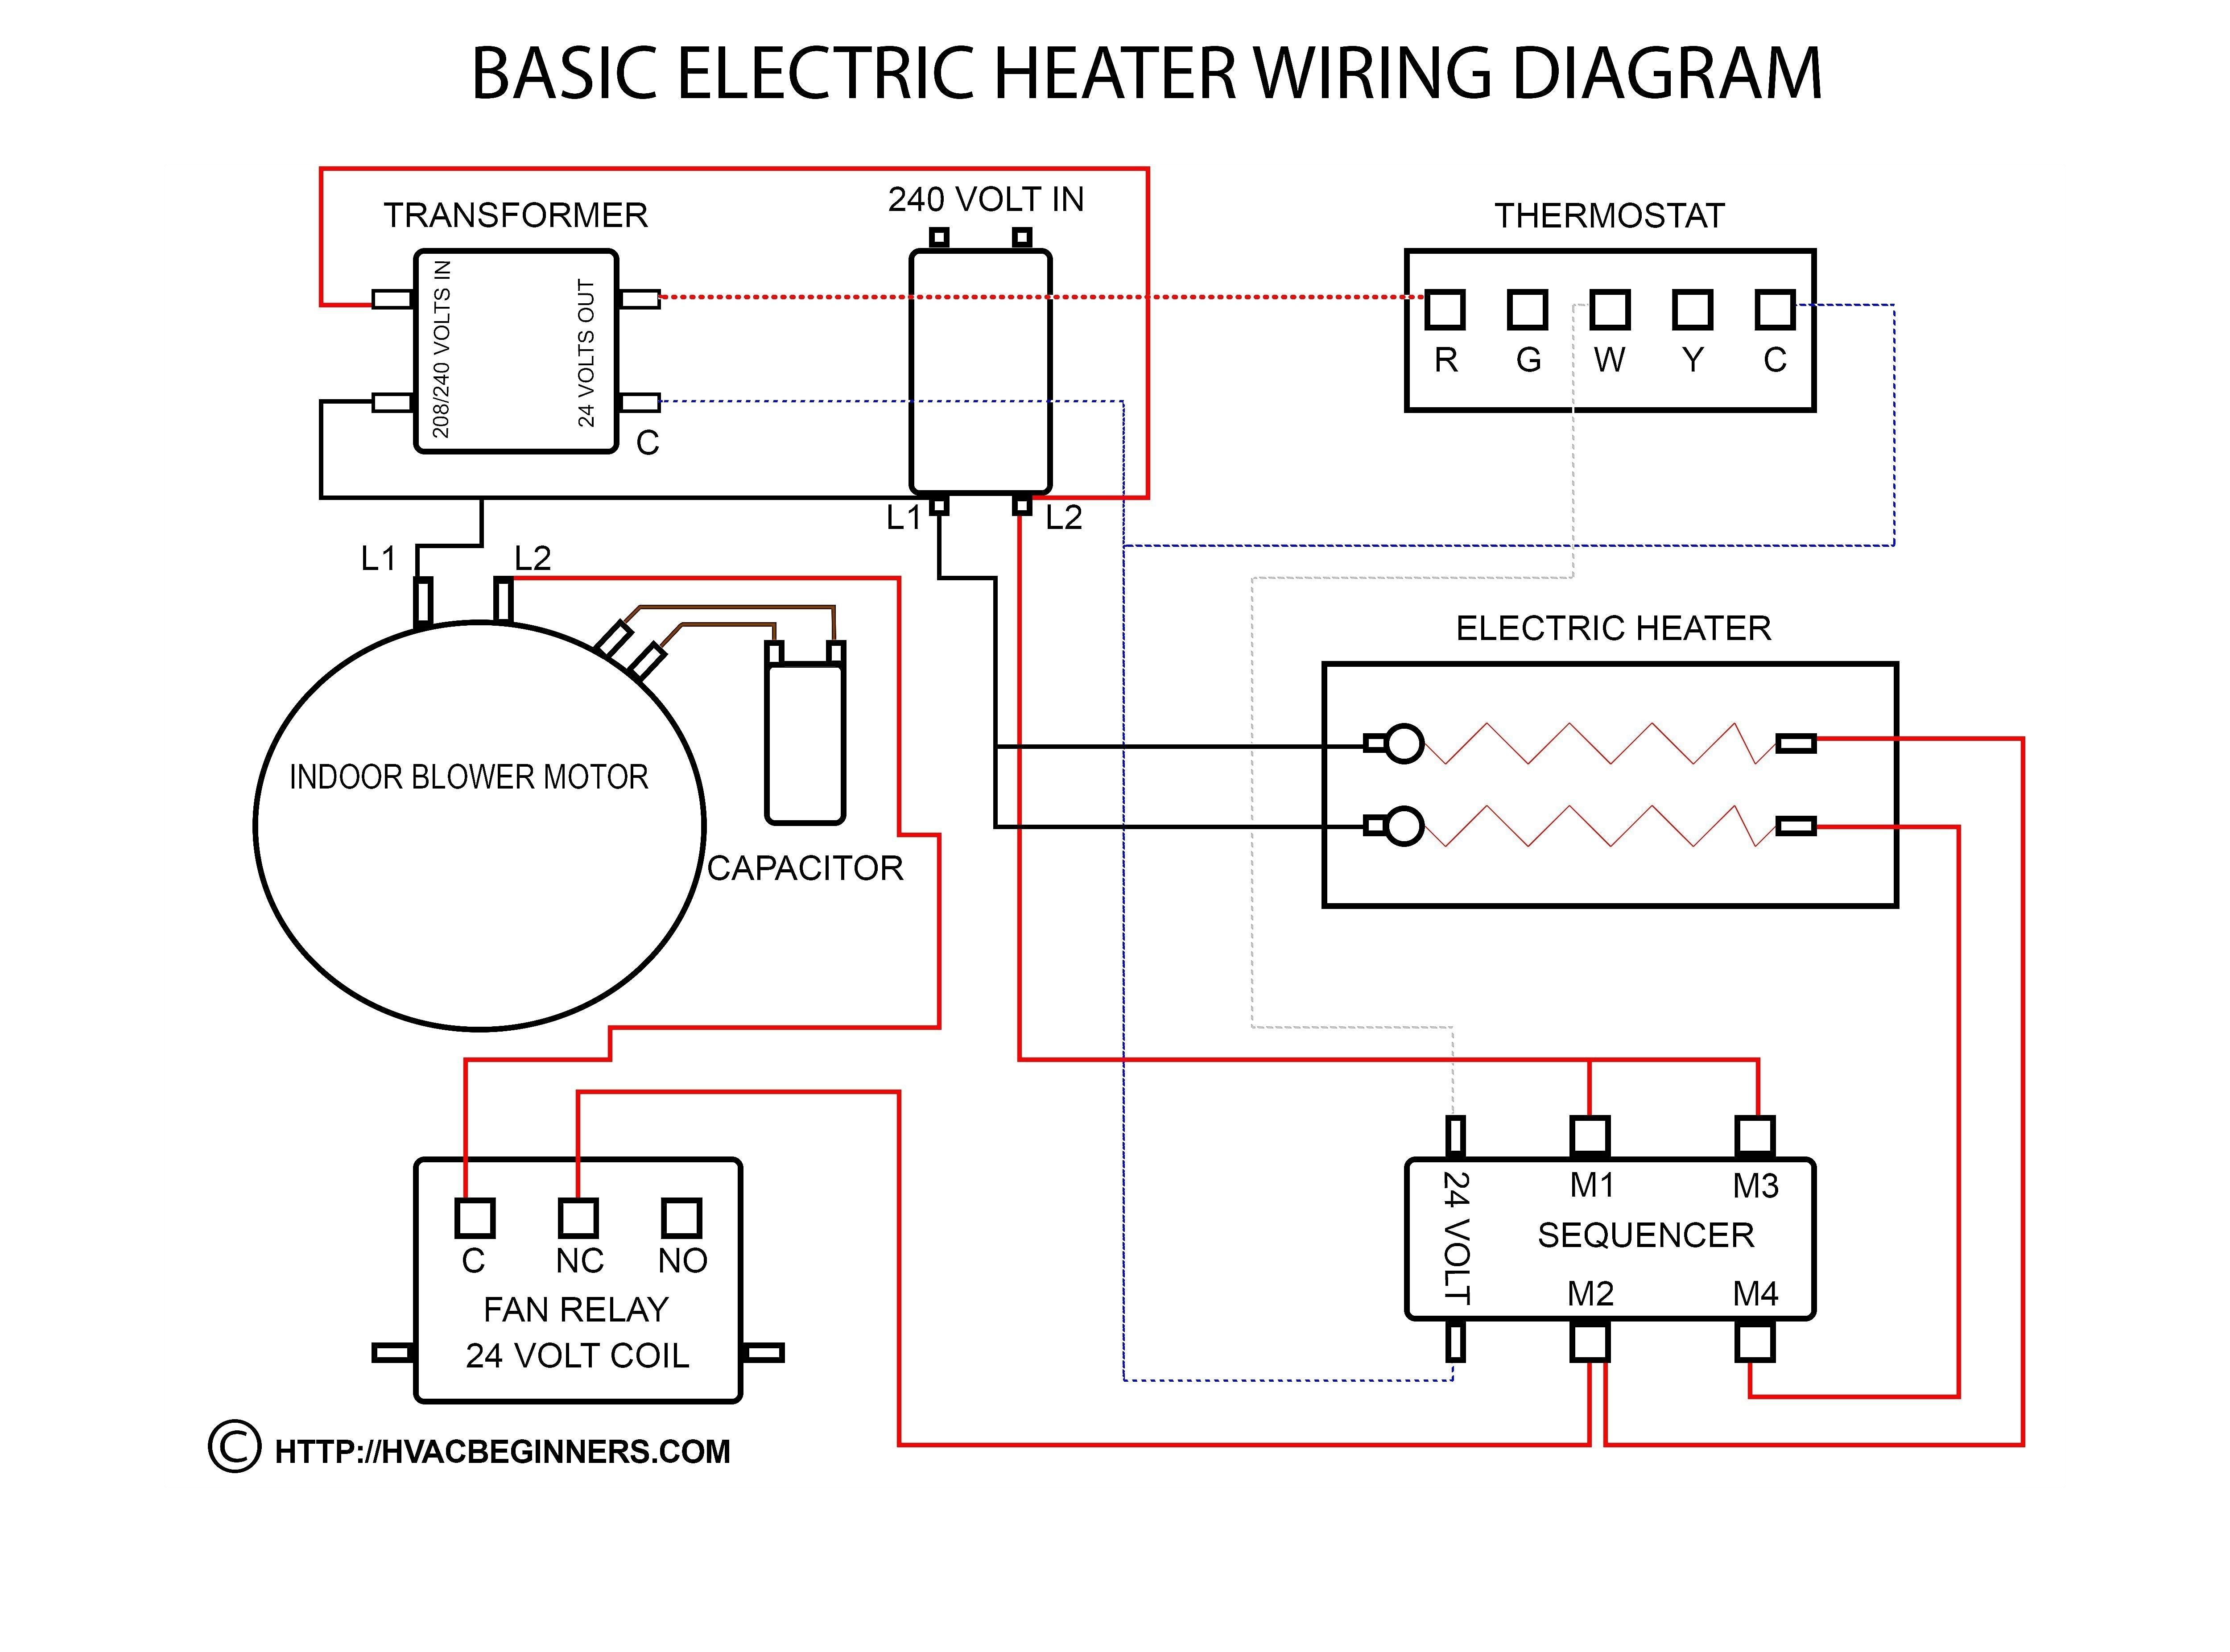 wagner electric motor wiring diagram Download-wagner wiring diagrams wiring rh westpol co Single Phase Motor Wiring Diagrams Single Phase Motor Wiring 18-c